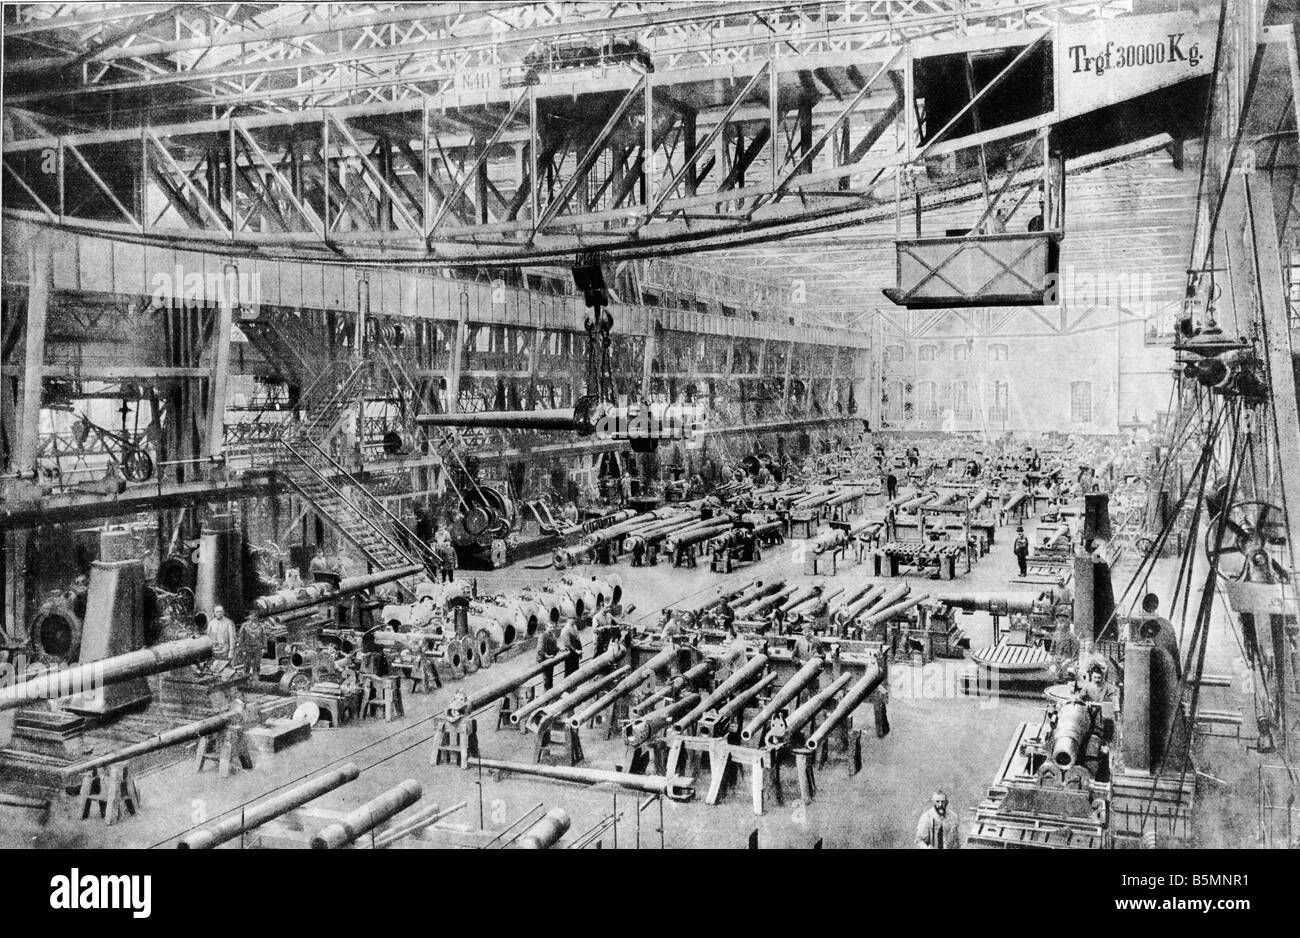 5 E2 I1 1914 E Armaments production at Krupp c 1914 Essen Friedrich Krupp AG Interior view armaments production - Stock Image